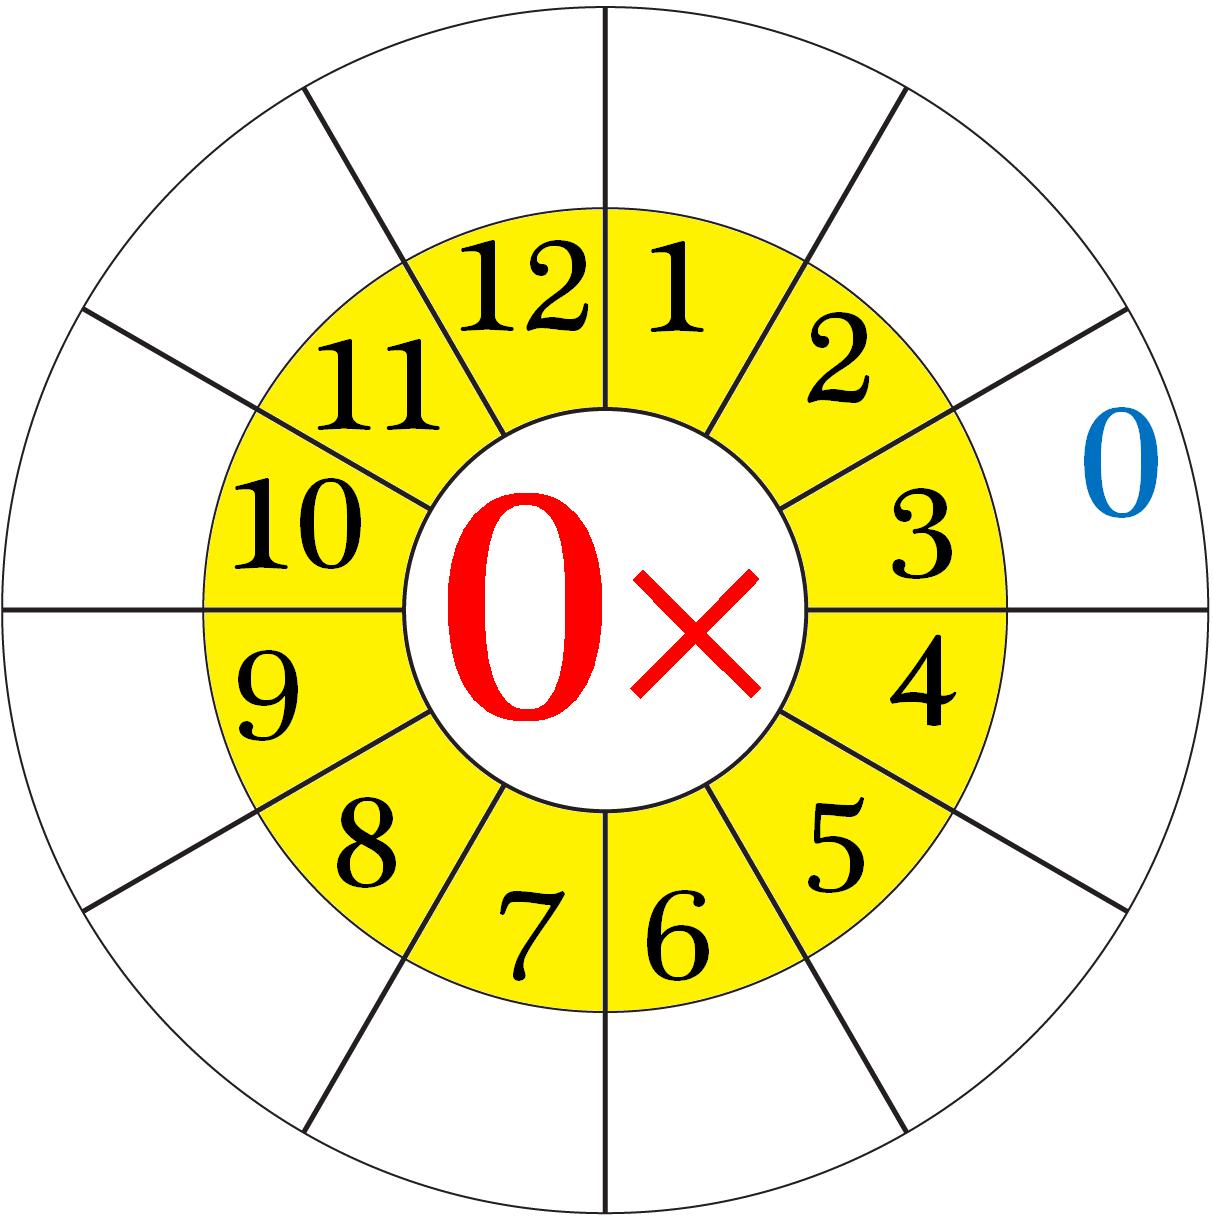 Worksheet on Multiplication Table of 0